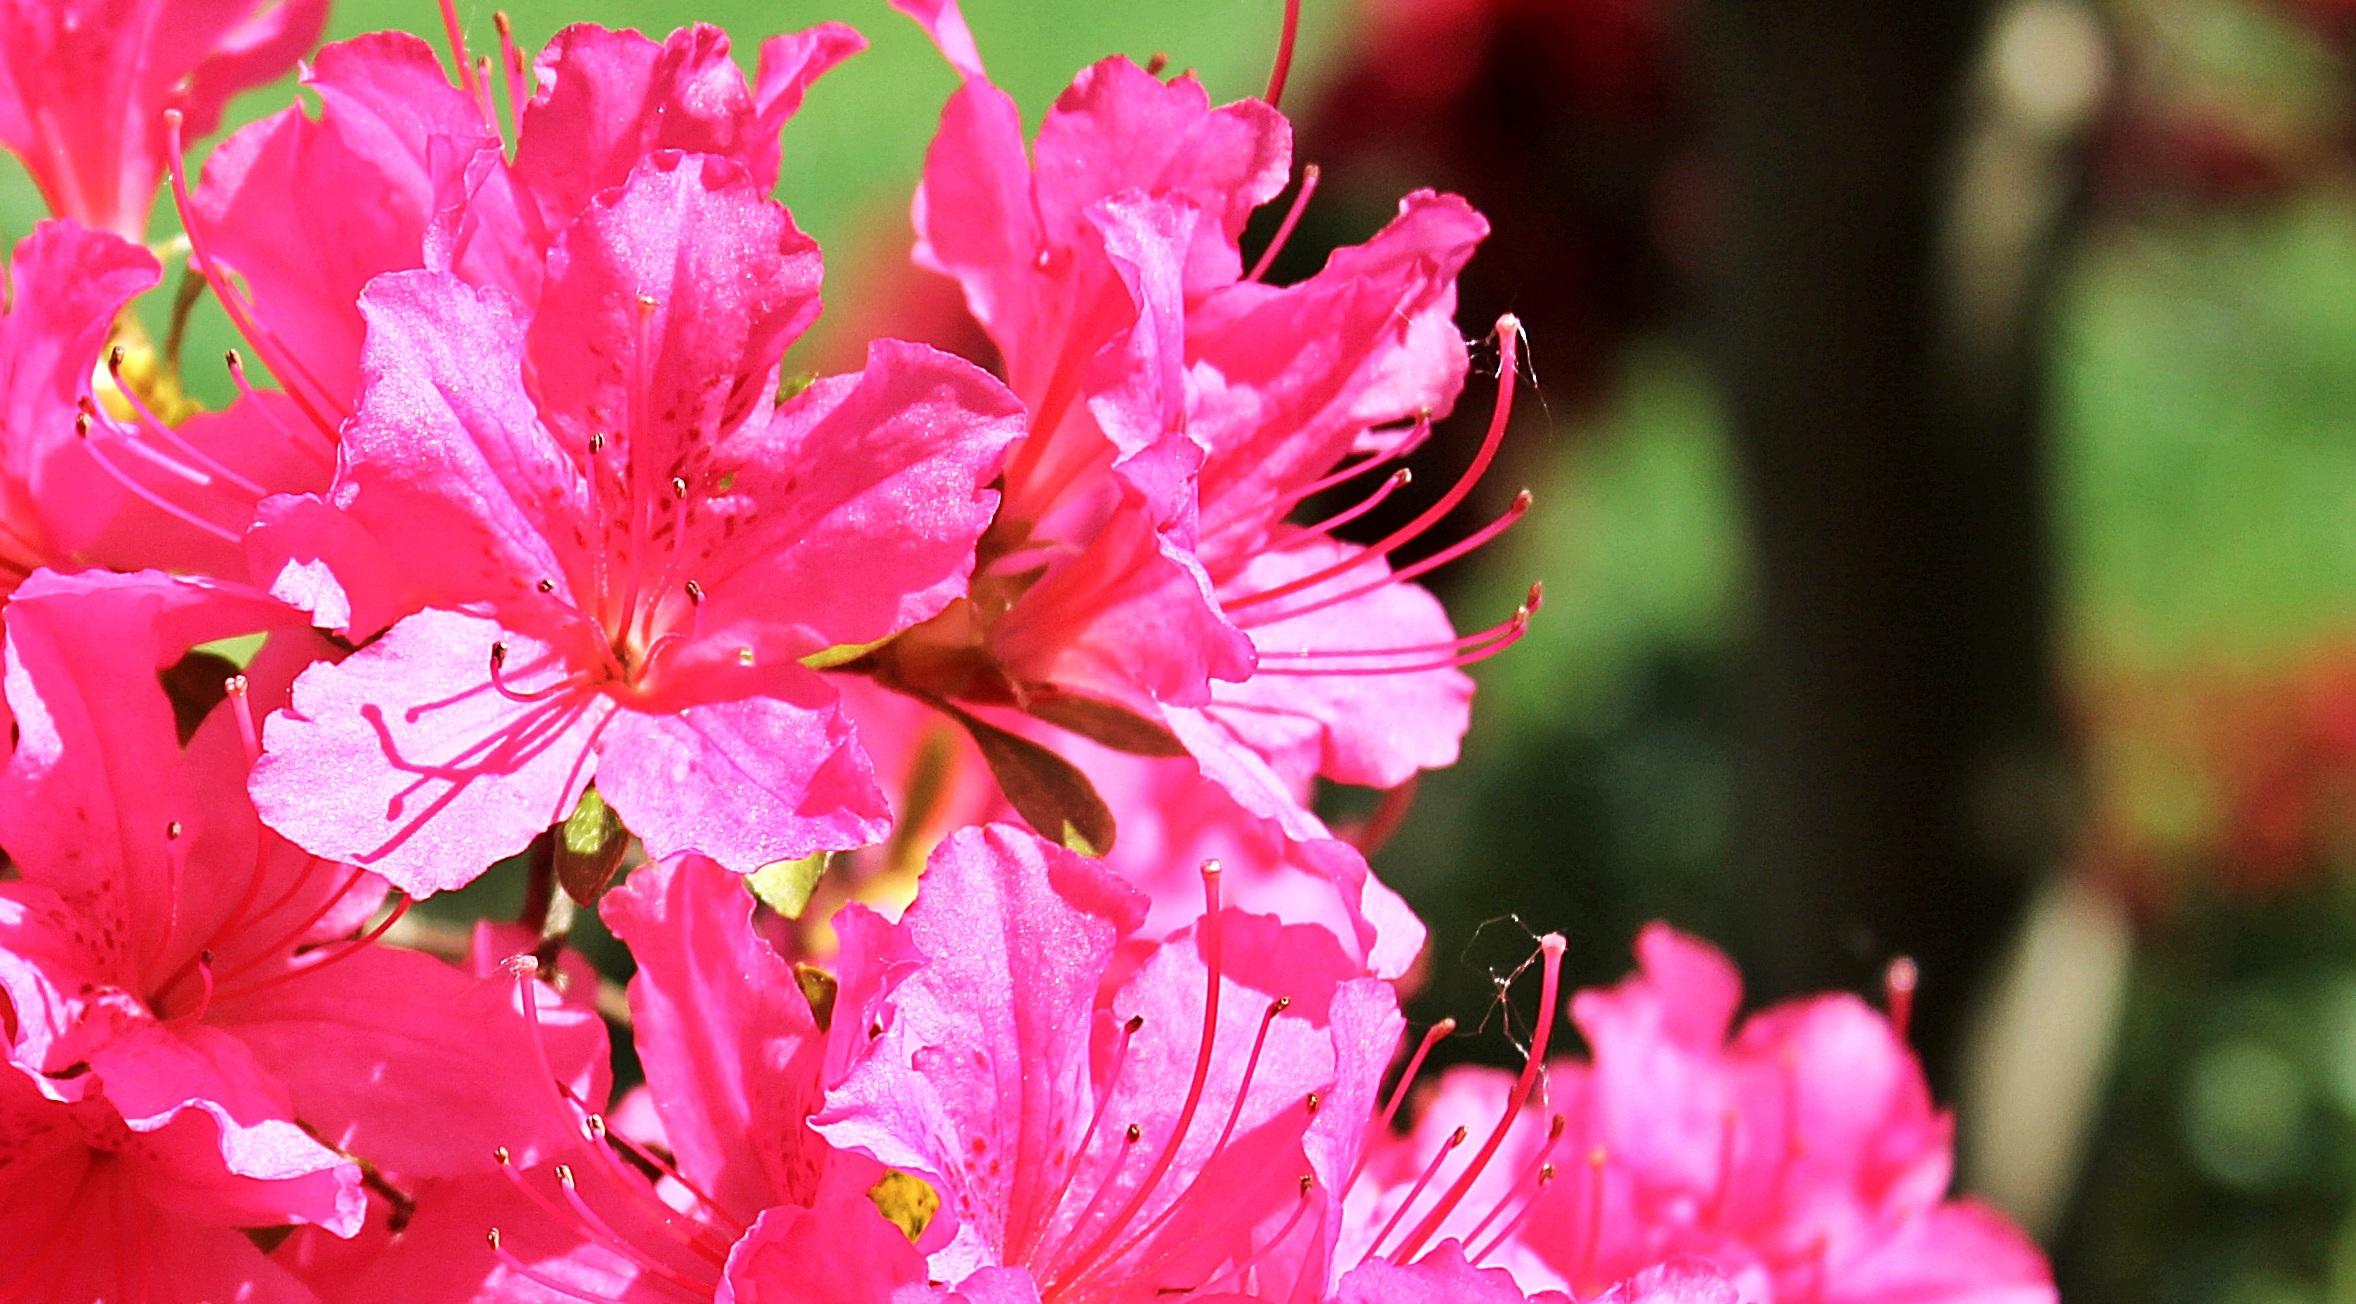 Free images blossom leaf flower petal summer bush spring blossom plant leaf flower petal summer bush spring botany garden pink flora flowers background shrub bright mightylinksfo